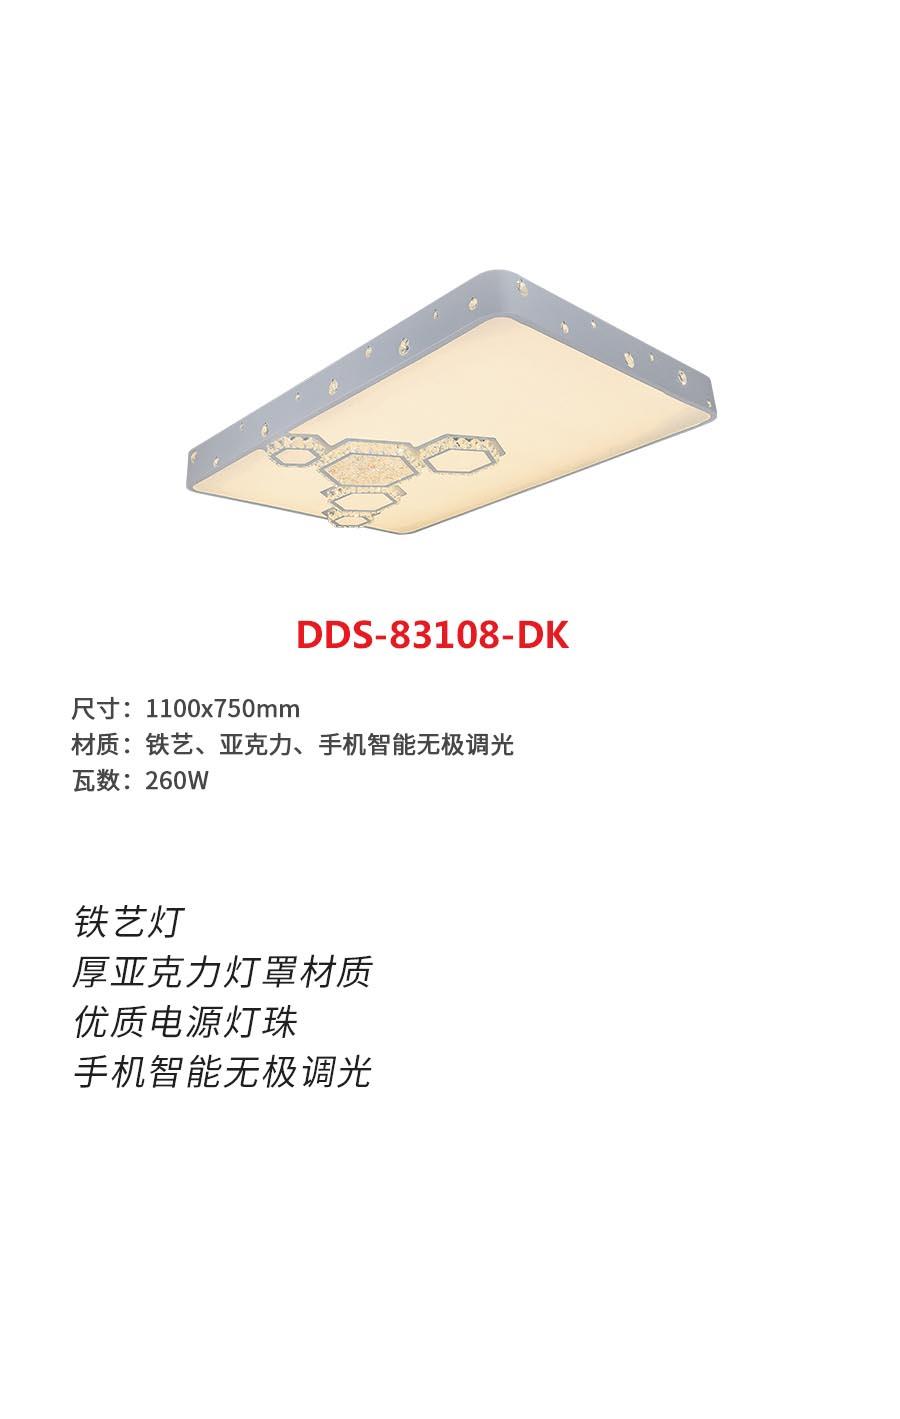 DDS-83108-dkb.jpg